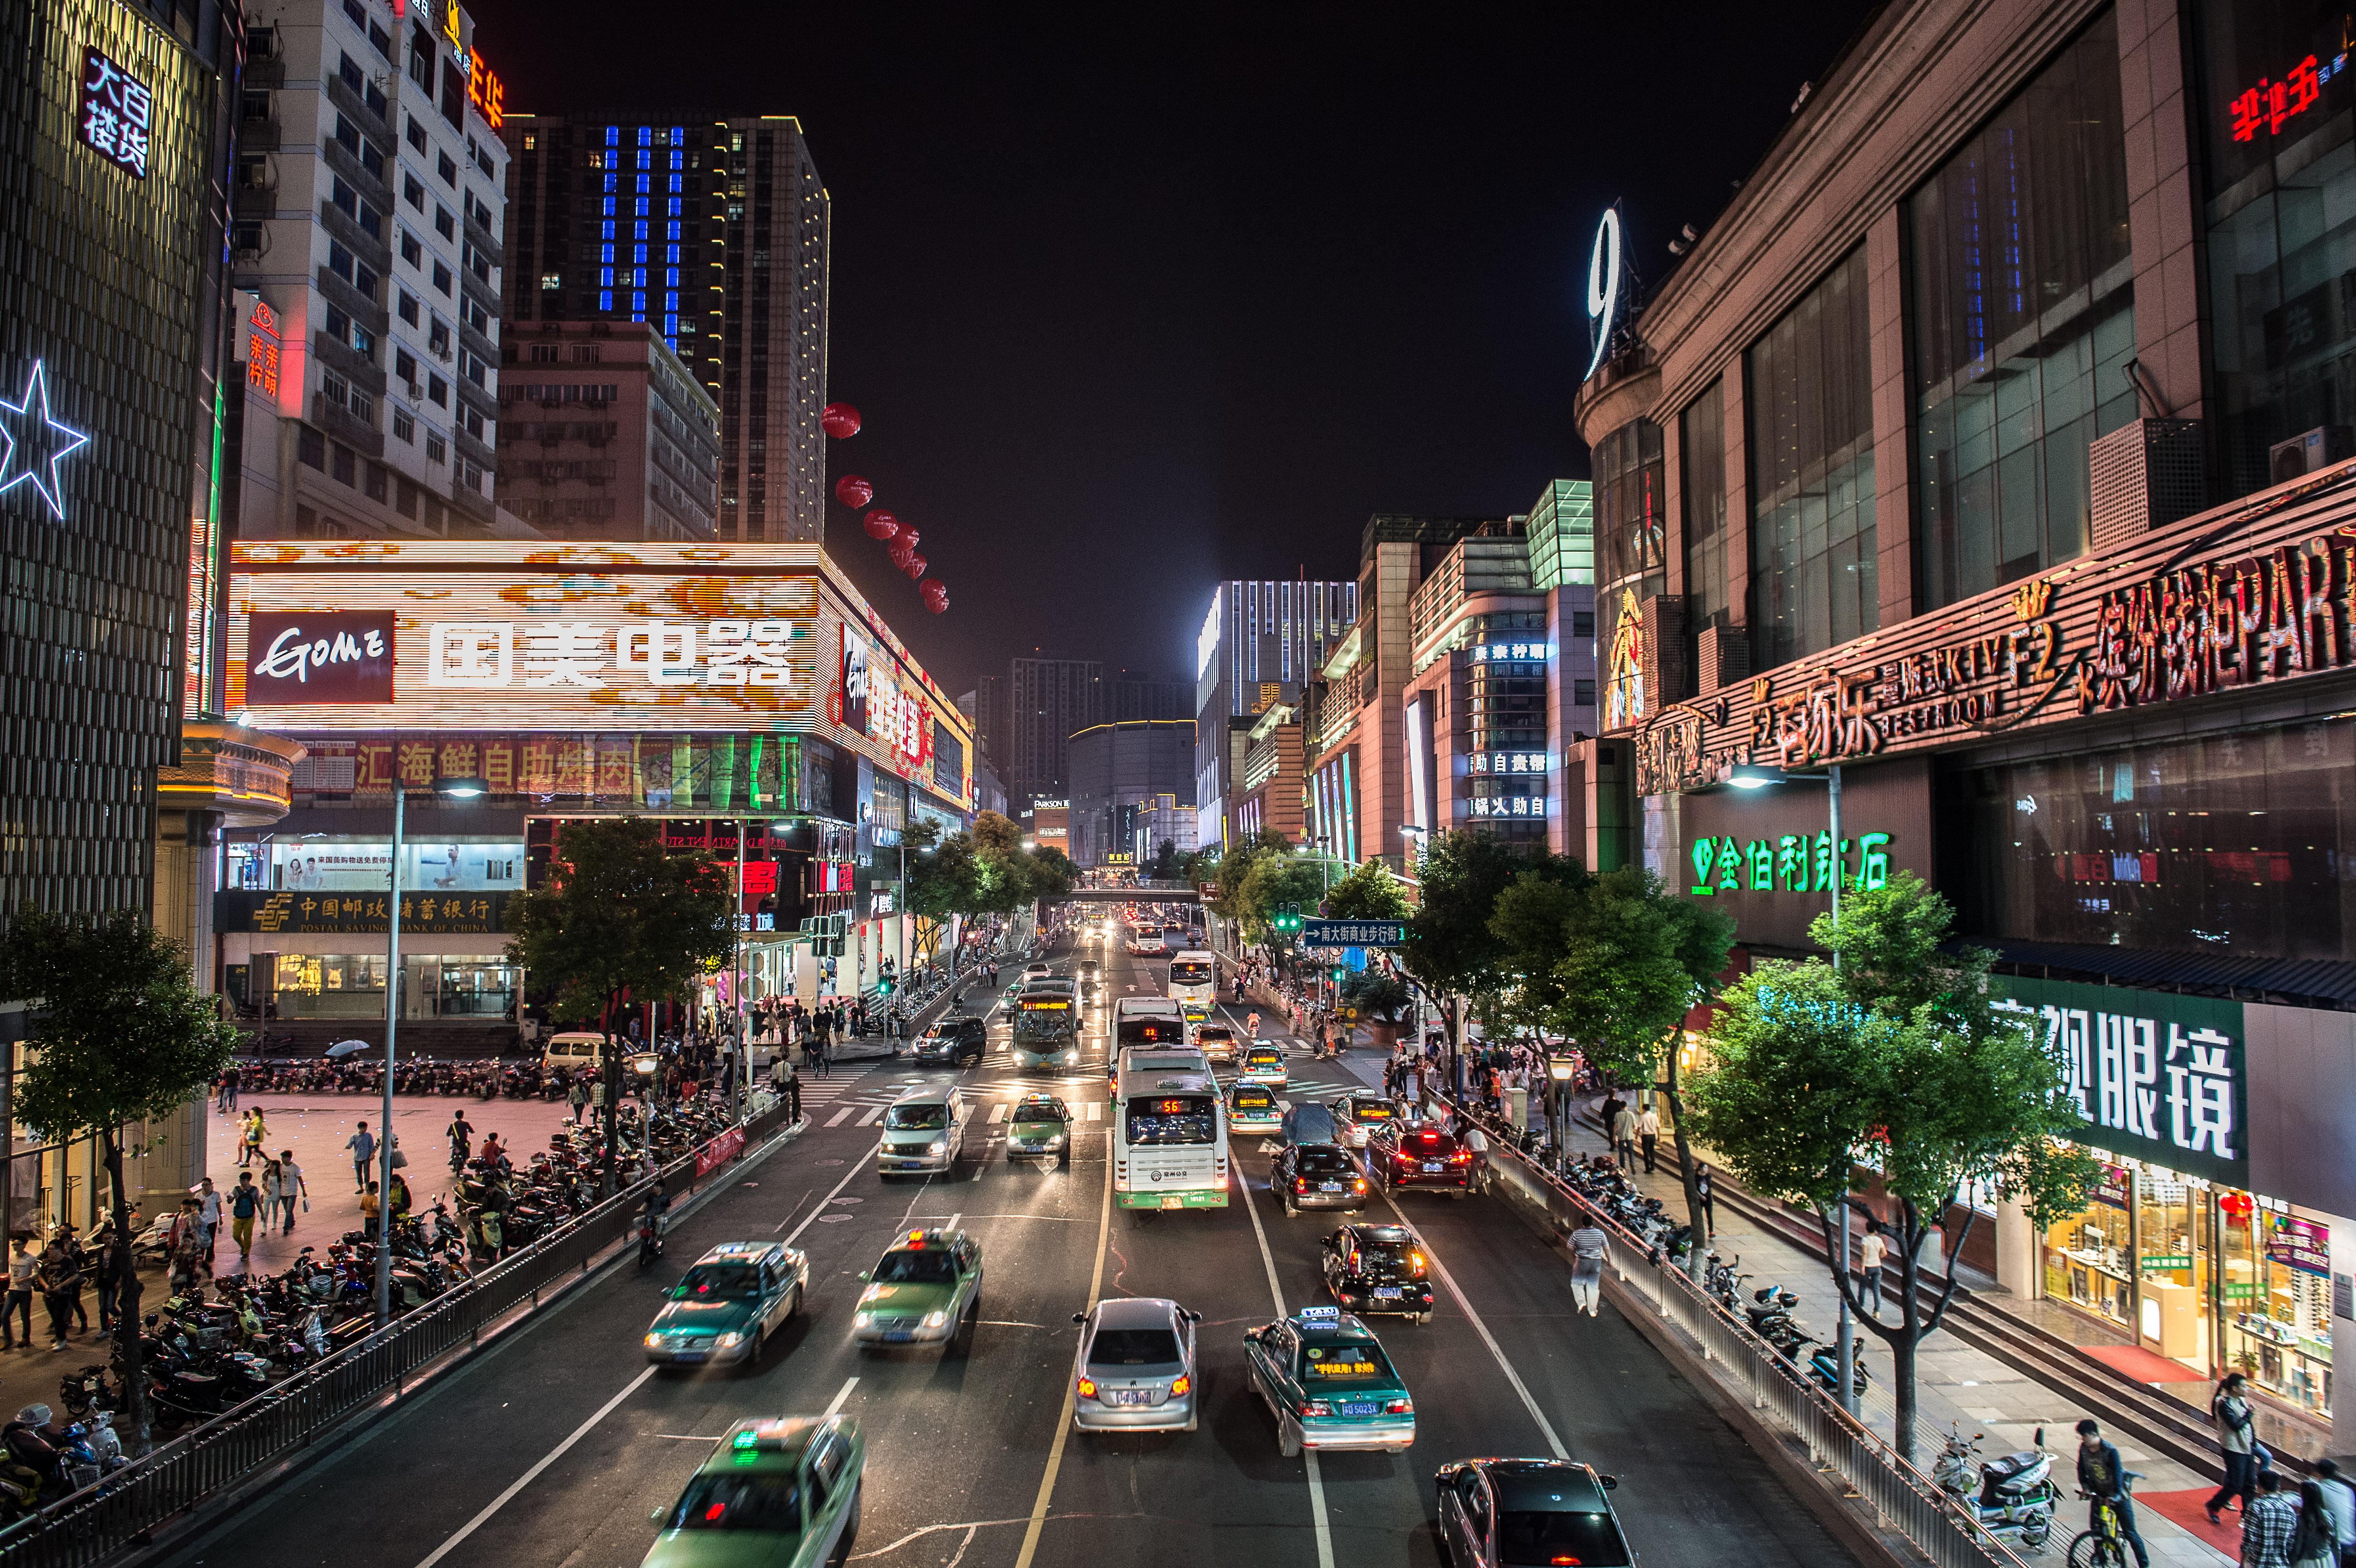 Foto: Befahrener Boulevard bei Nacht